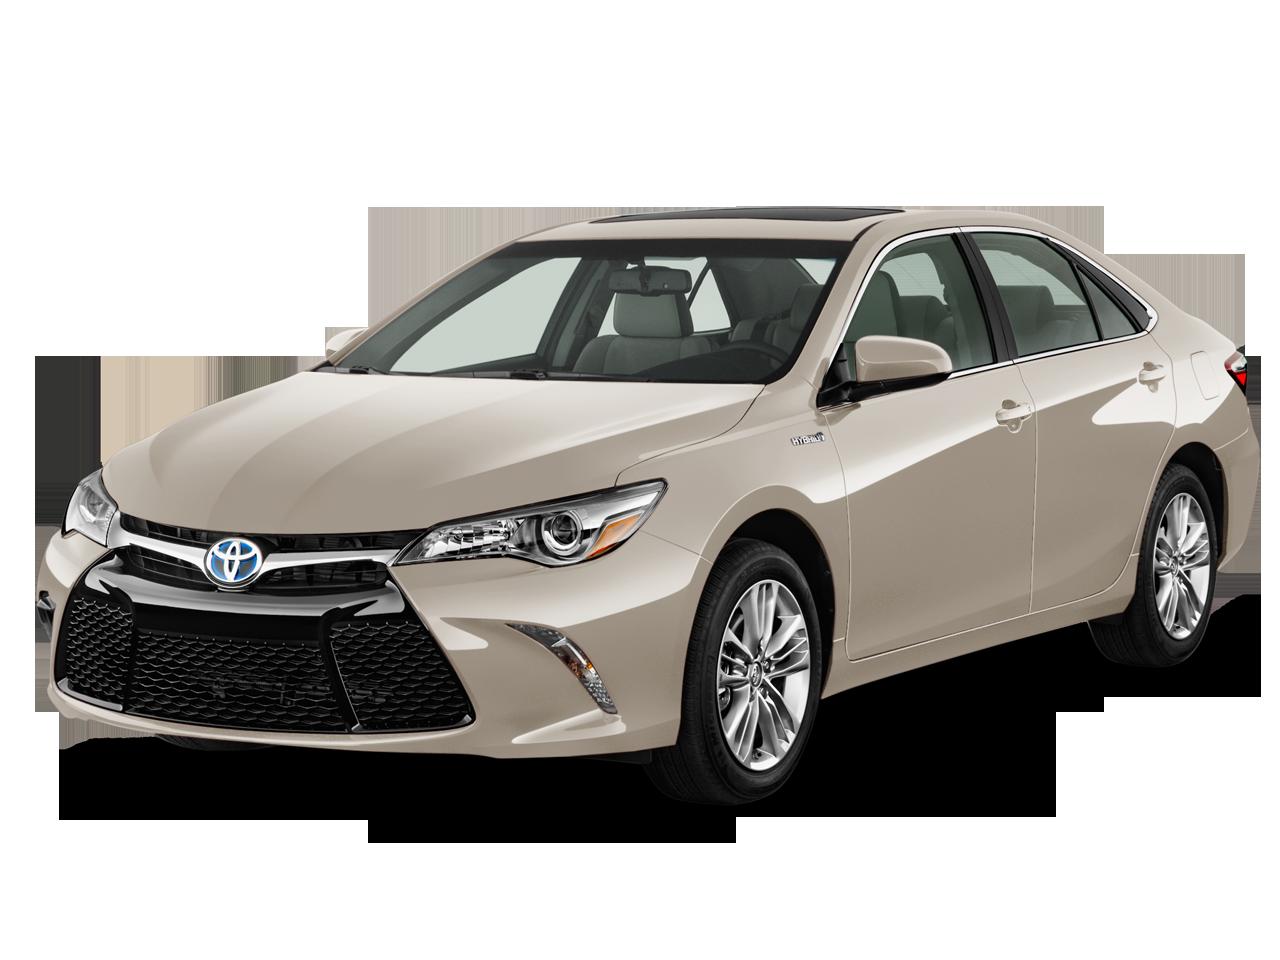 Toyota dealer incentives motor inn toyota of carroll for Motor inn toyota of carroll